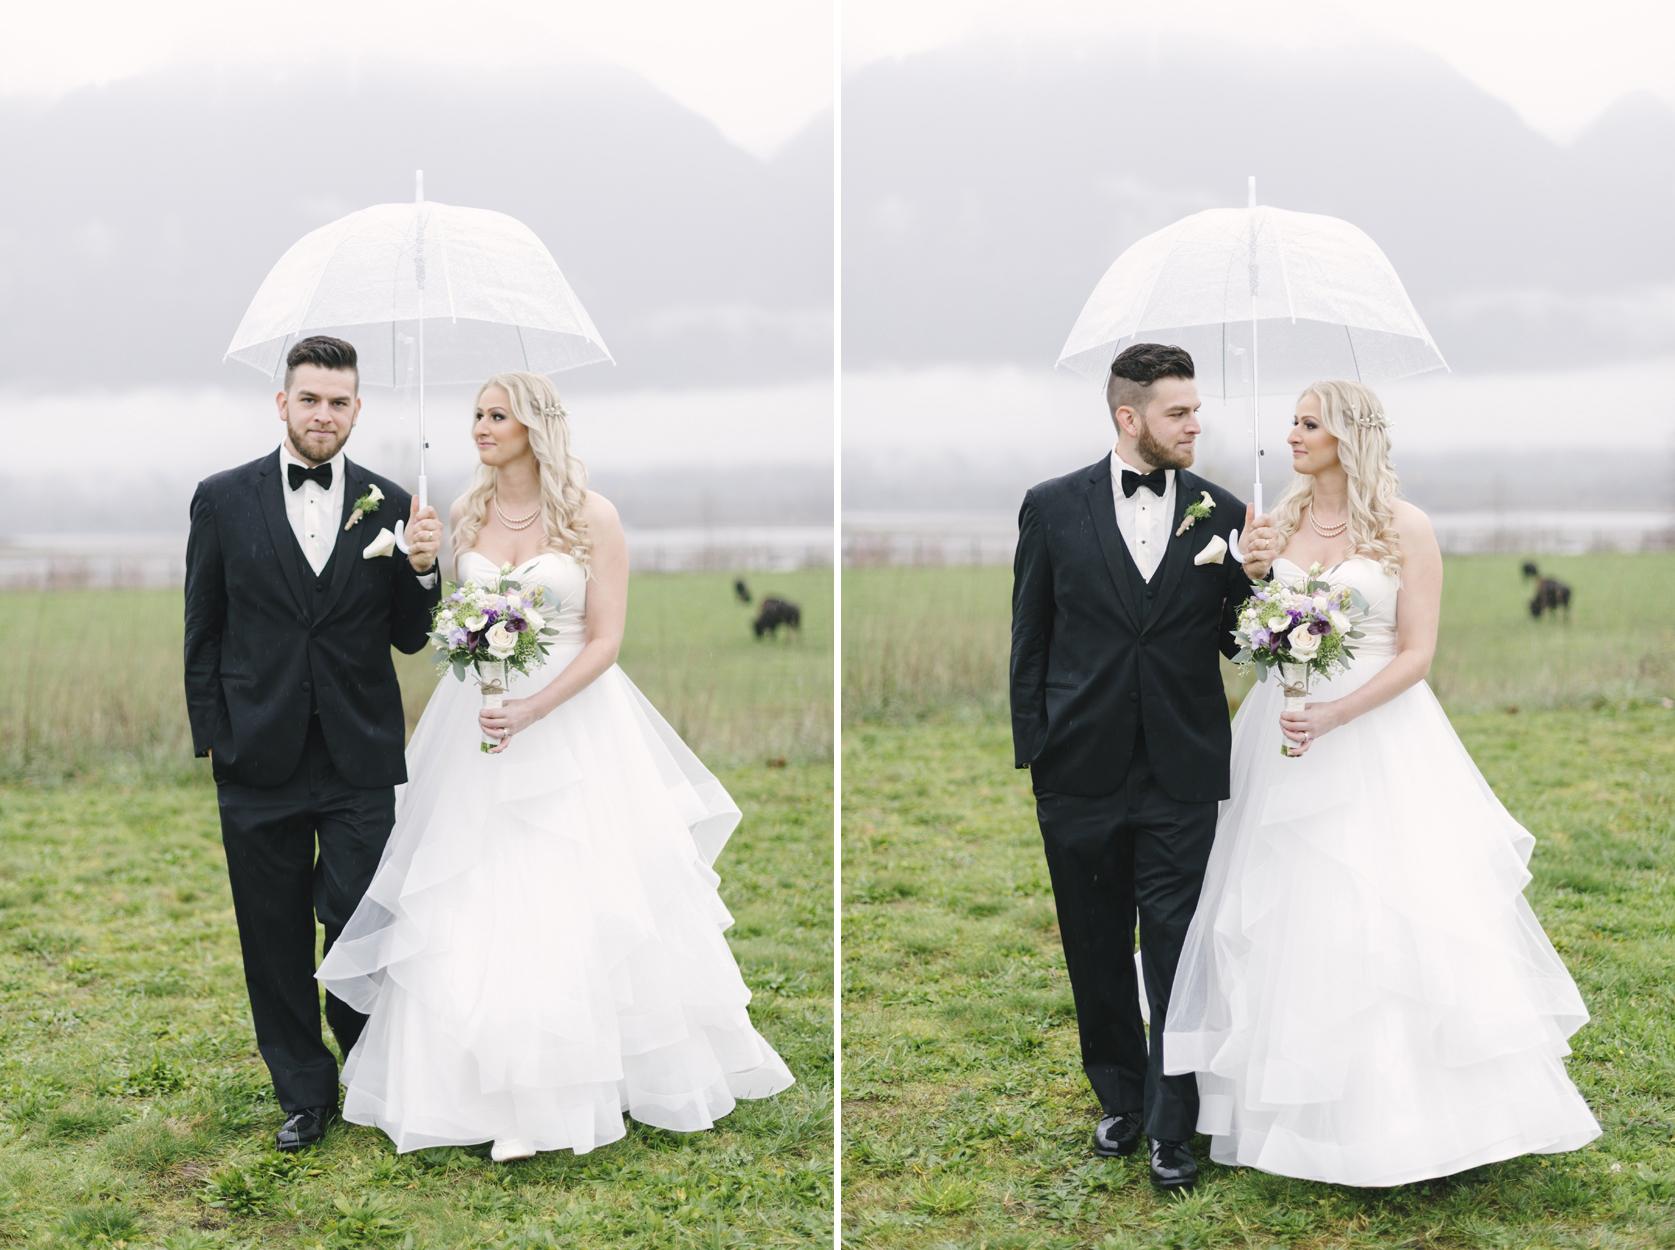 fraser-river-lodge-wedding-16.jpg